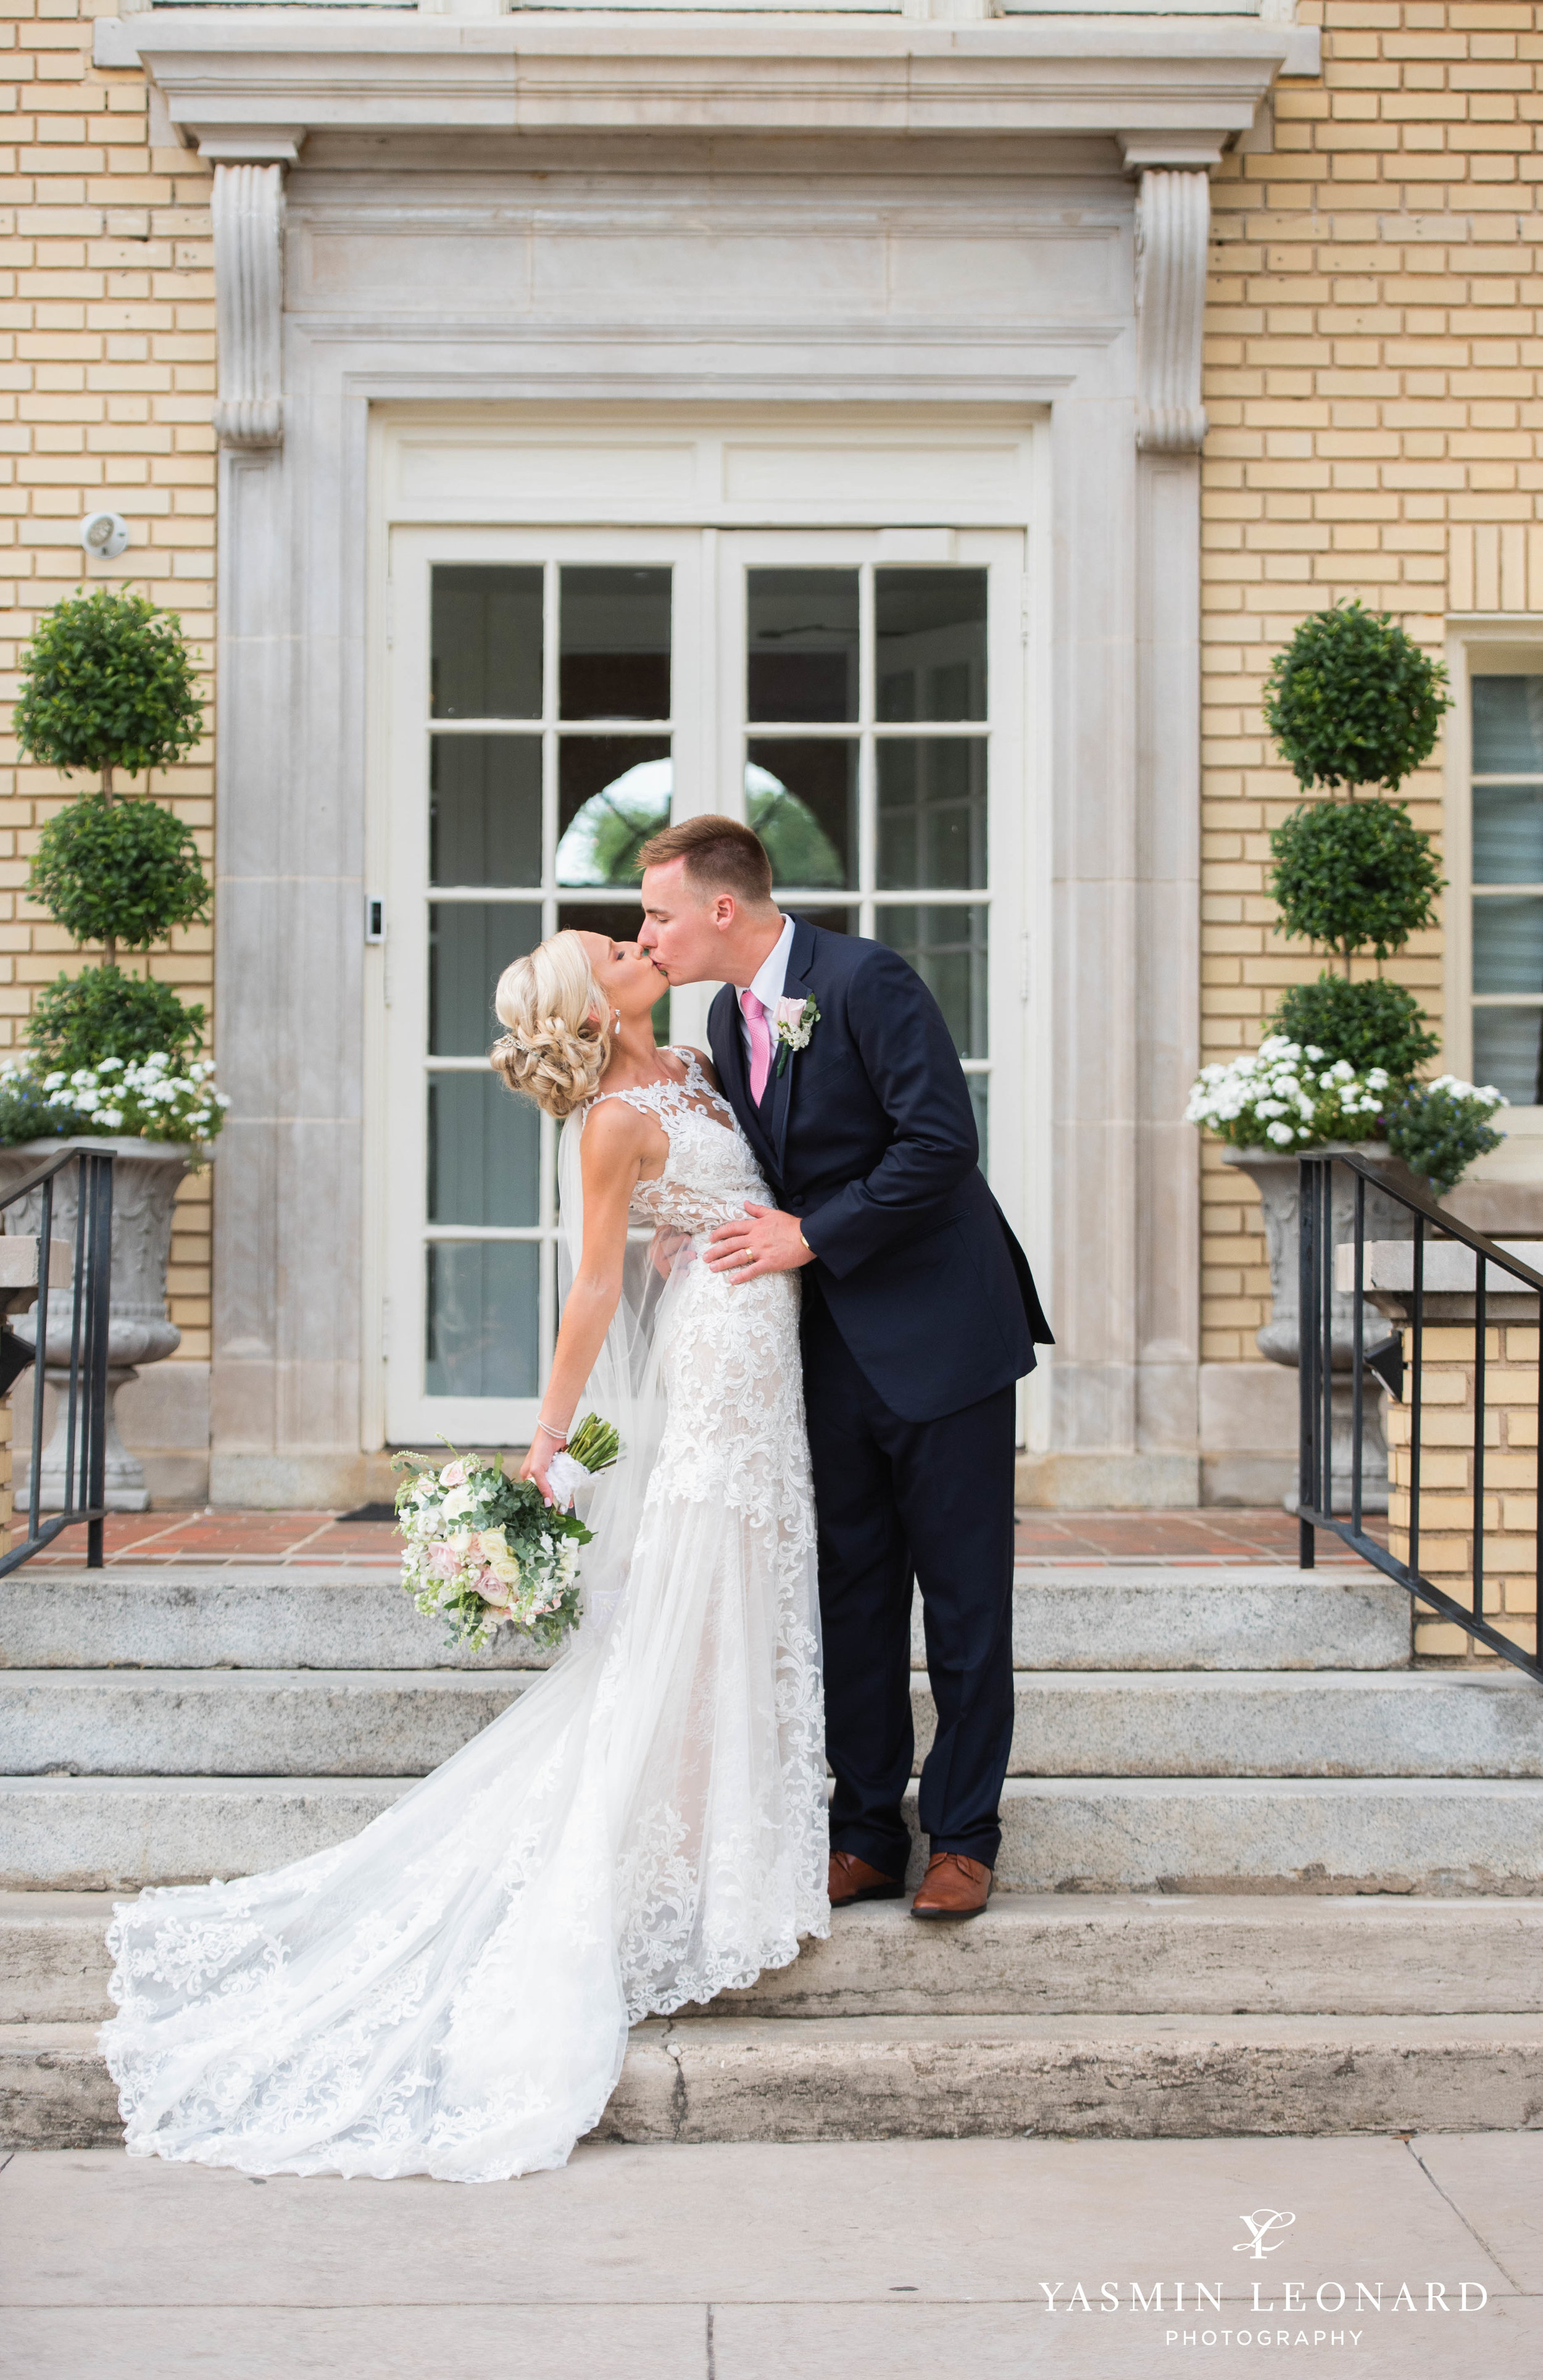 Separk Mansion - NC Weddings - Gastonia Wedding - NC Wedding Venues - Pink and Blue Wedding Ideas - Pink Bridesmaid Dresses - Yasmin Leonard Photography-36.jpg